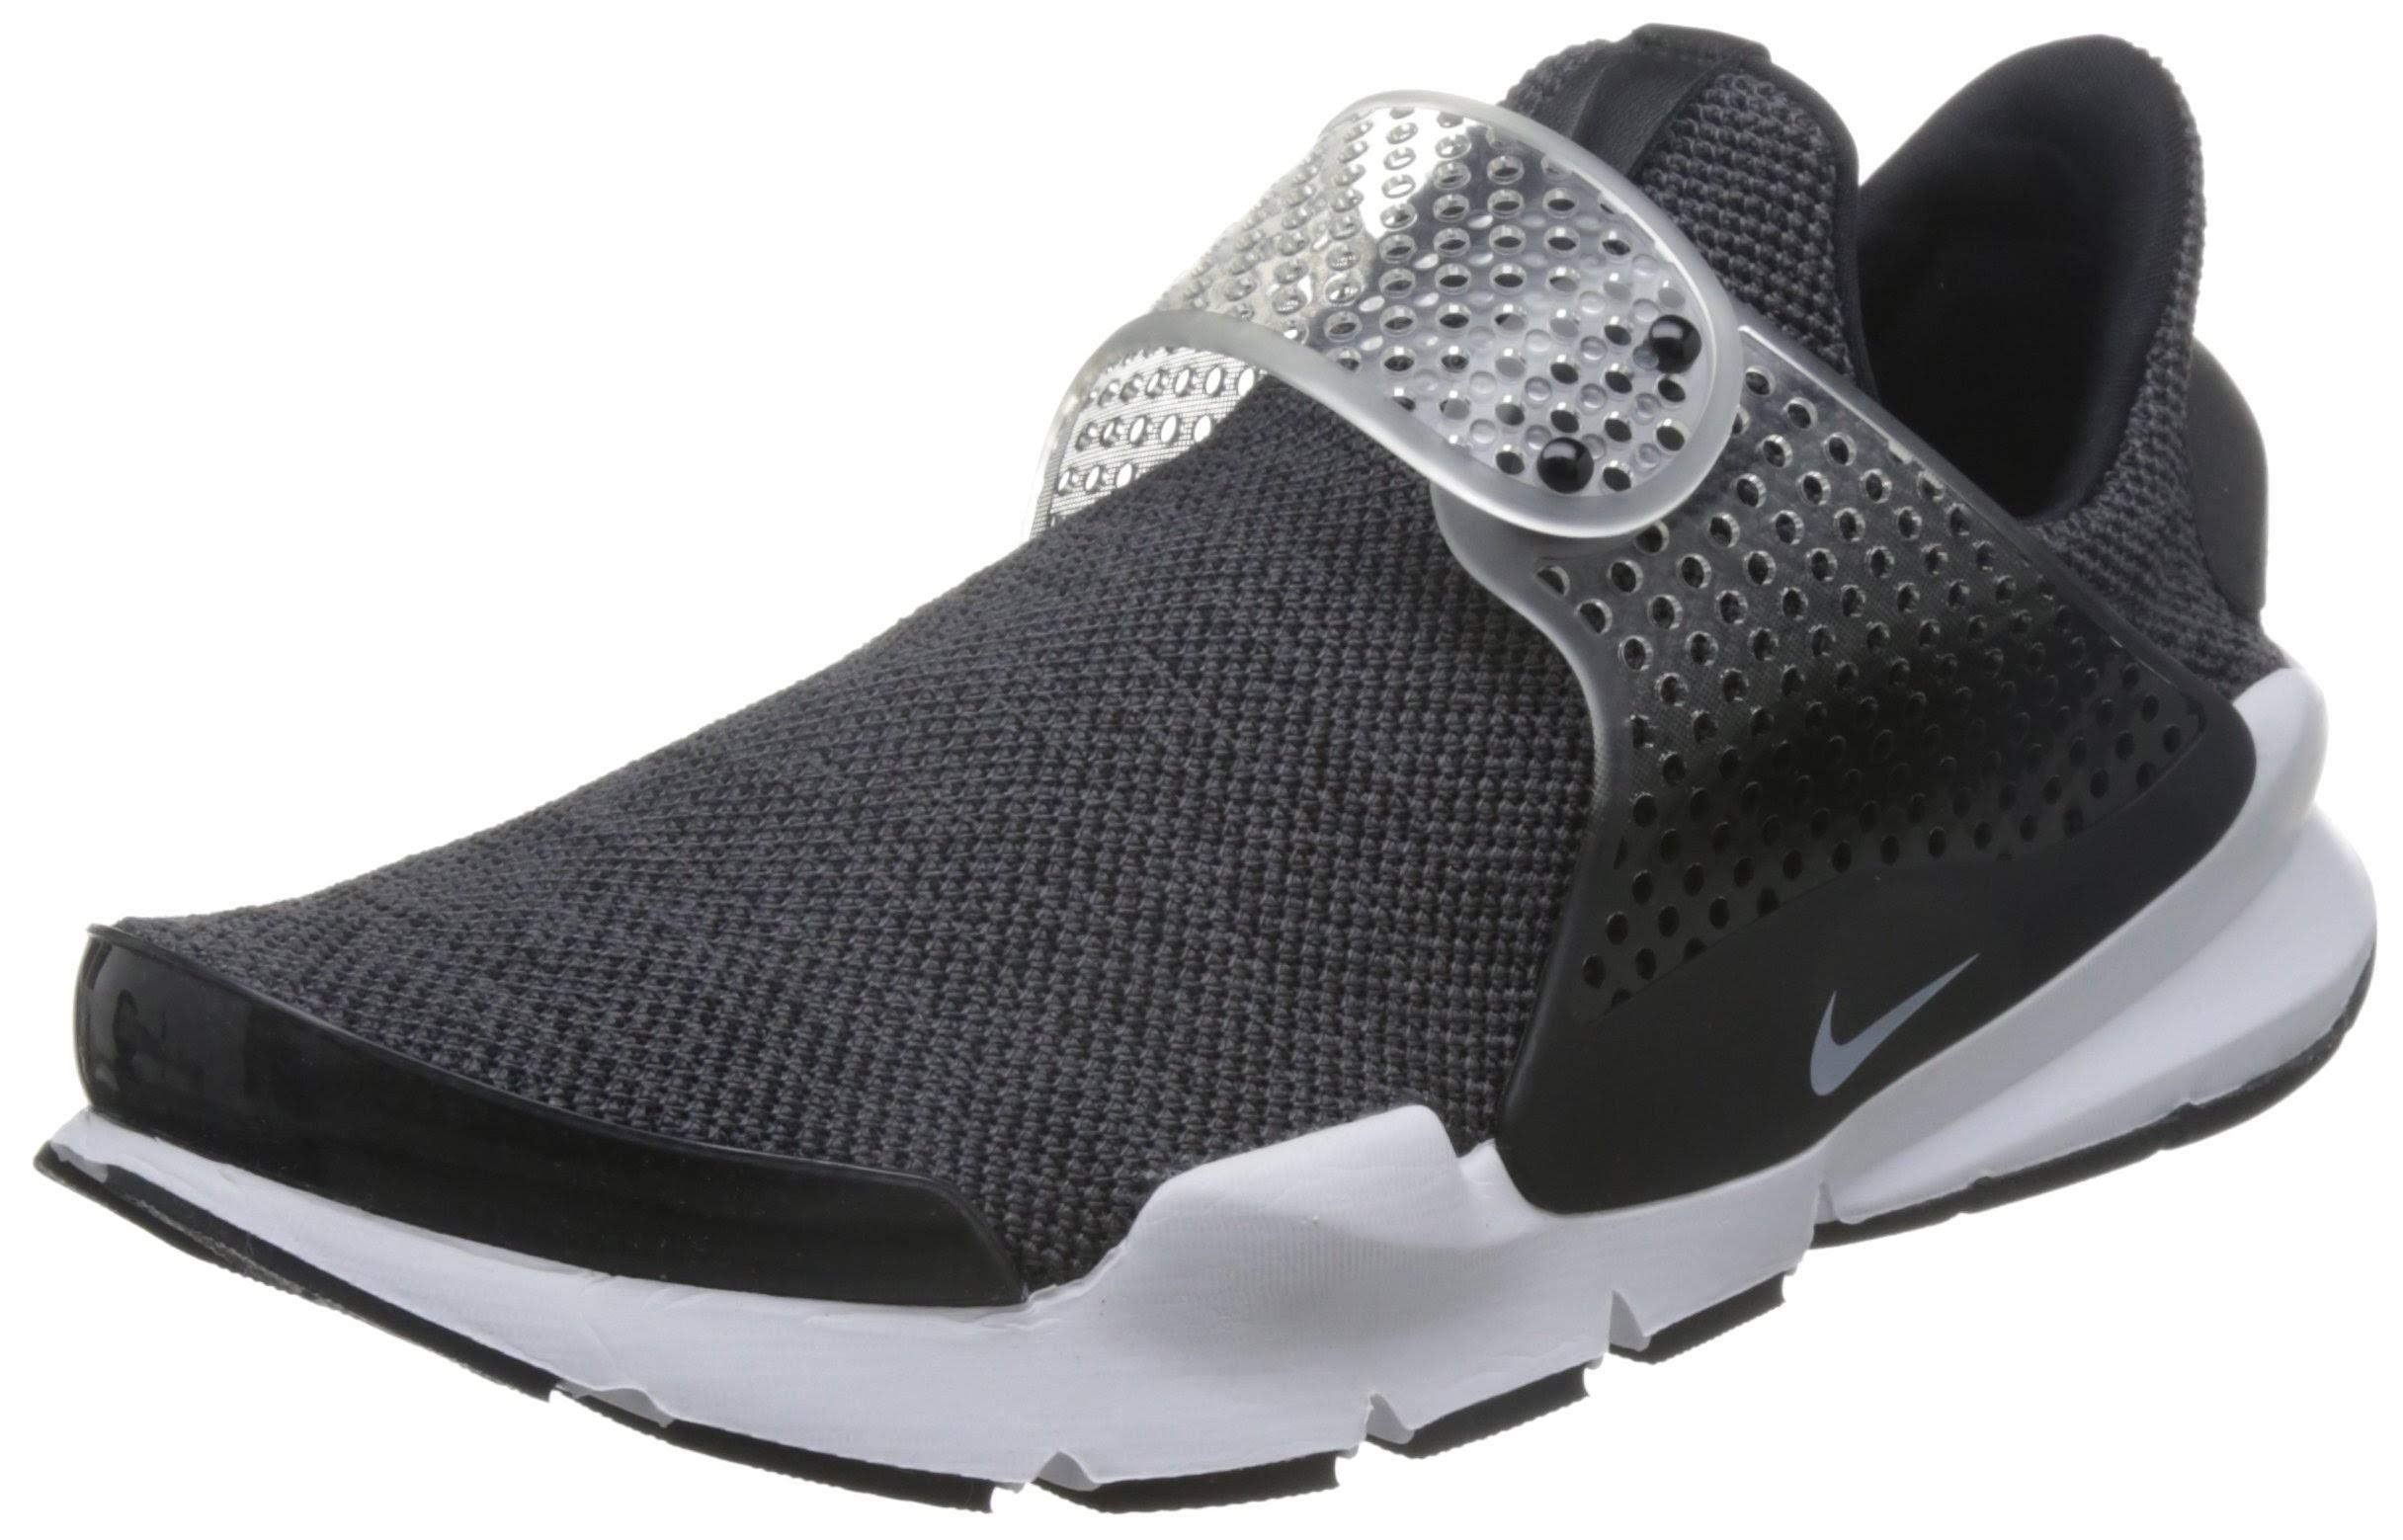 002 Negro 10 Blanco Nike Sz Sock Dart Se 911404 Gris Tamaño Oscuro wSnqvA8g